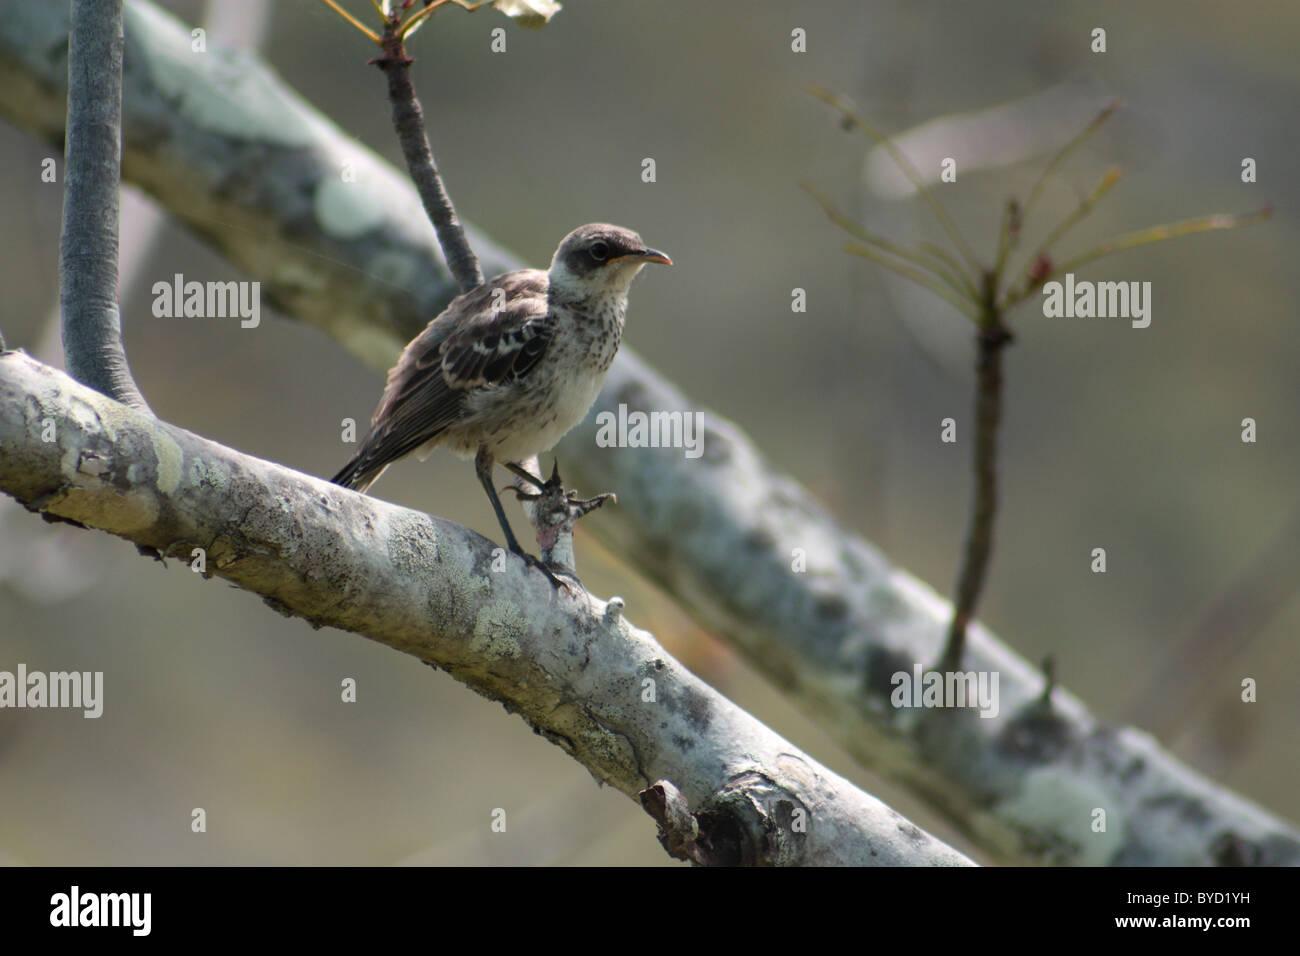 Mocking bird on Isla Isabela in the Galapagos Islands - Stock Image